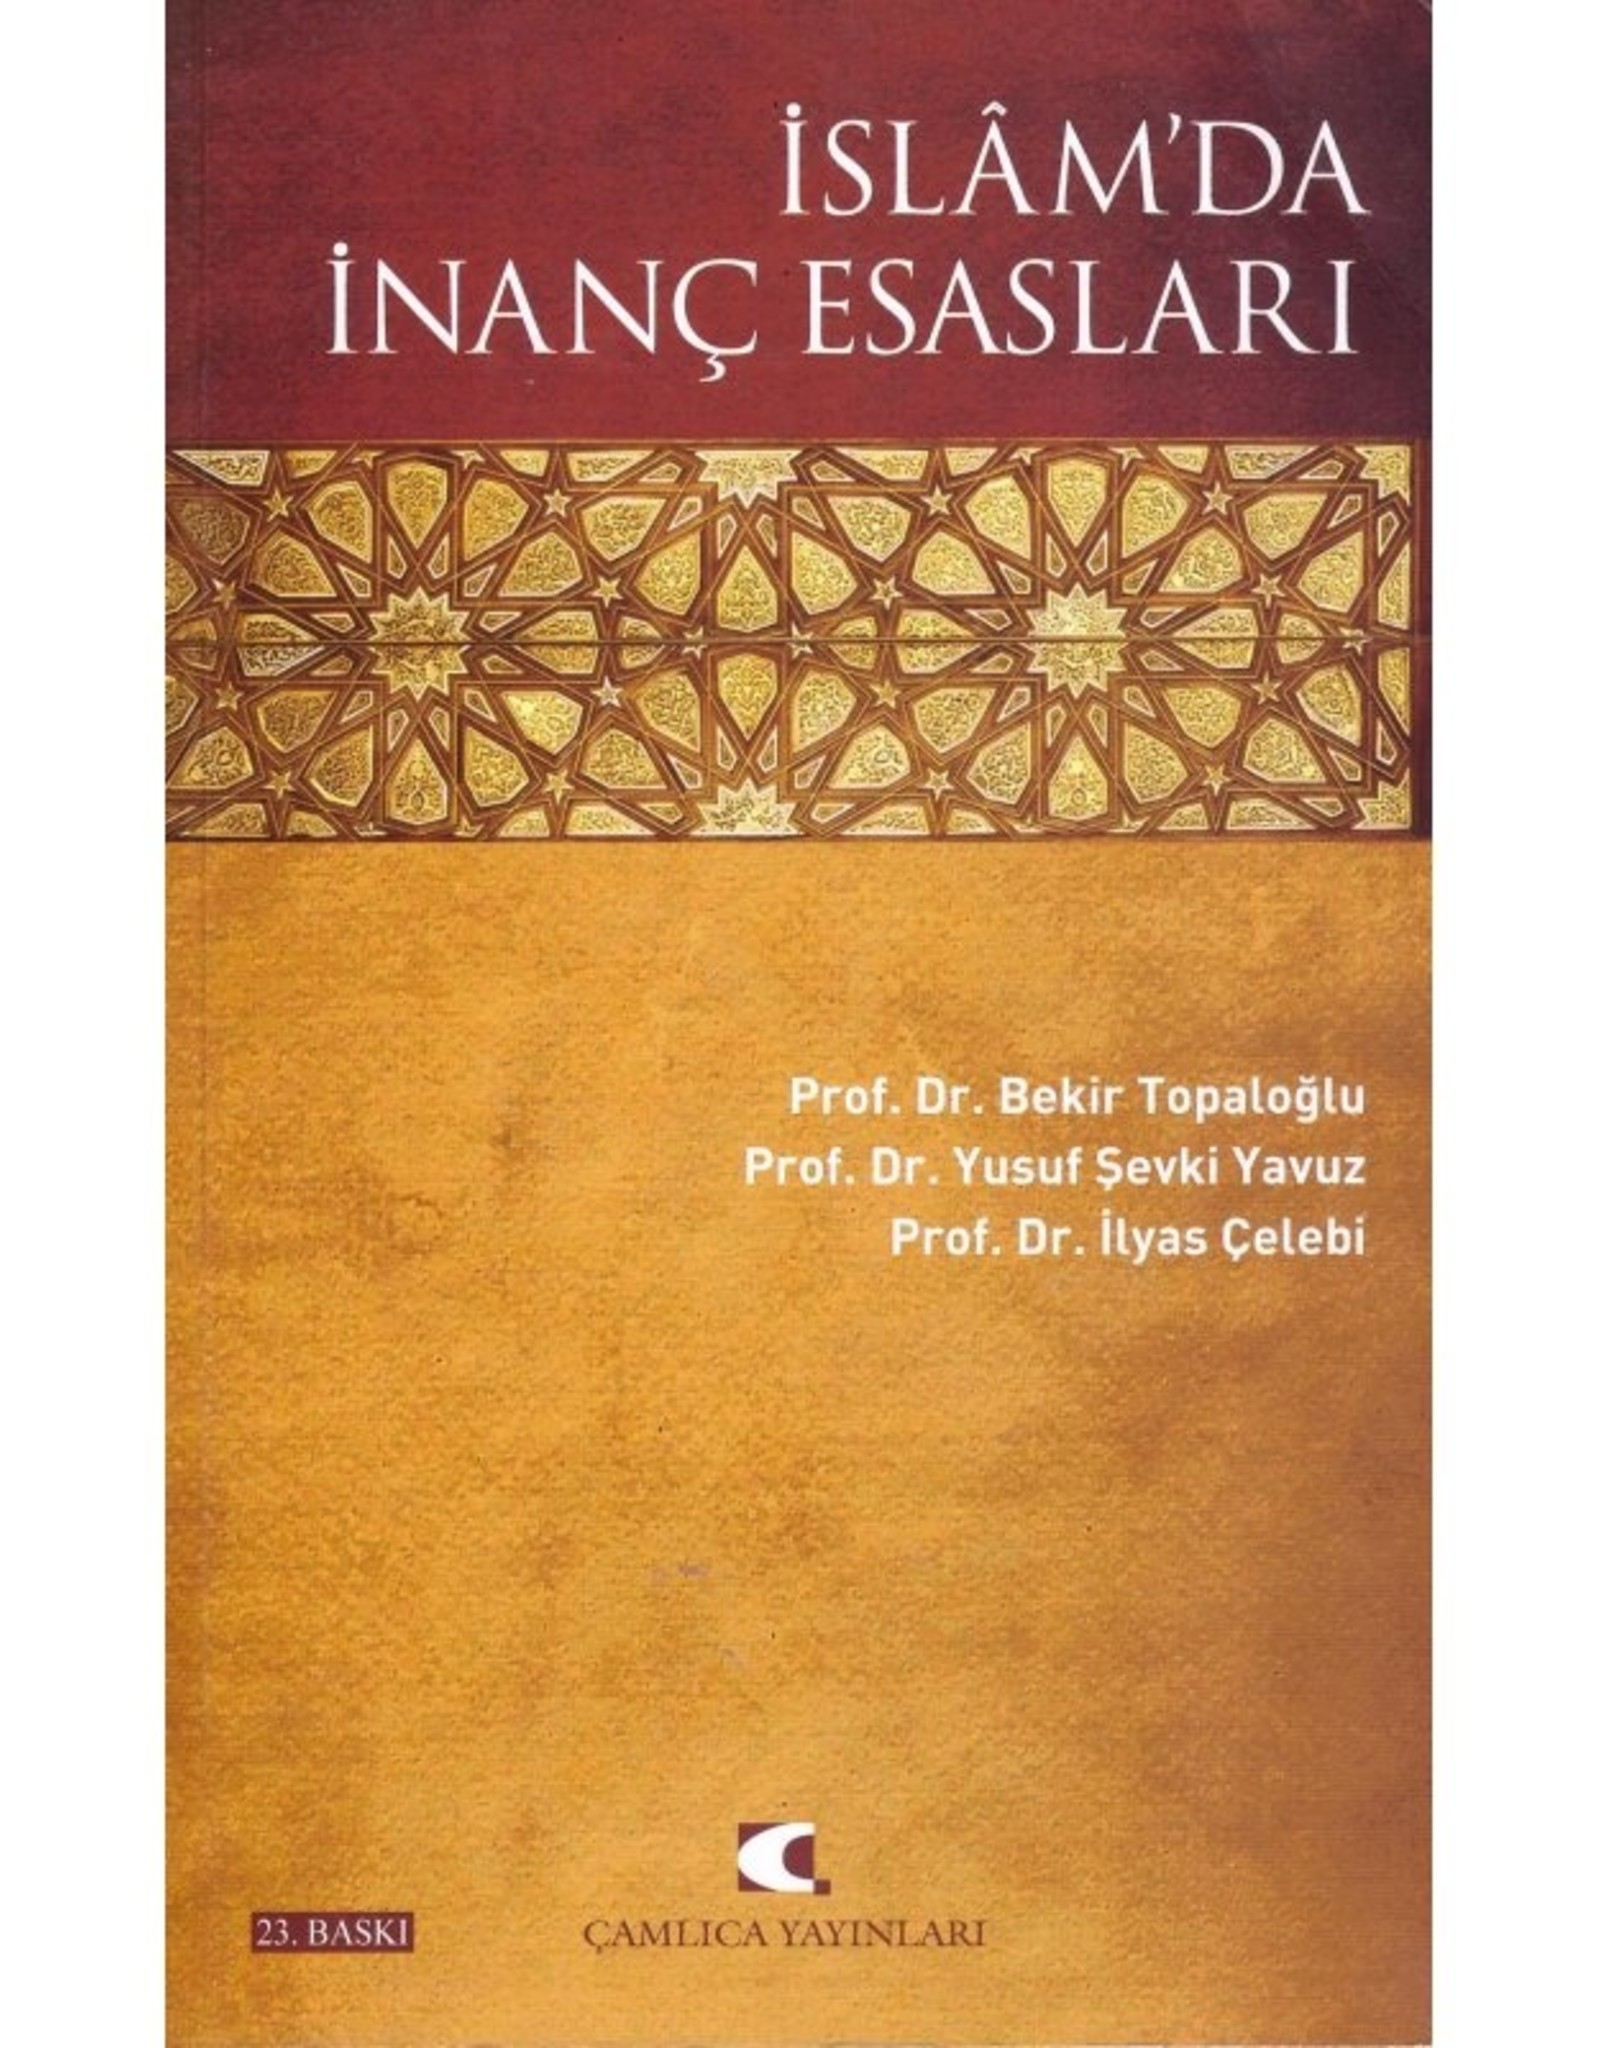 Islam'da Inanç Esasları